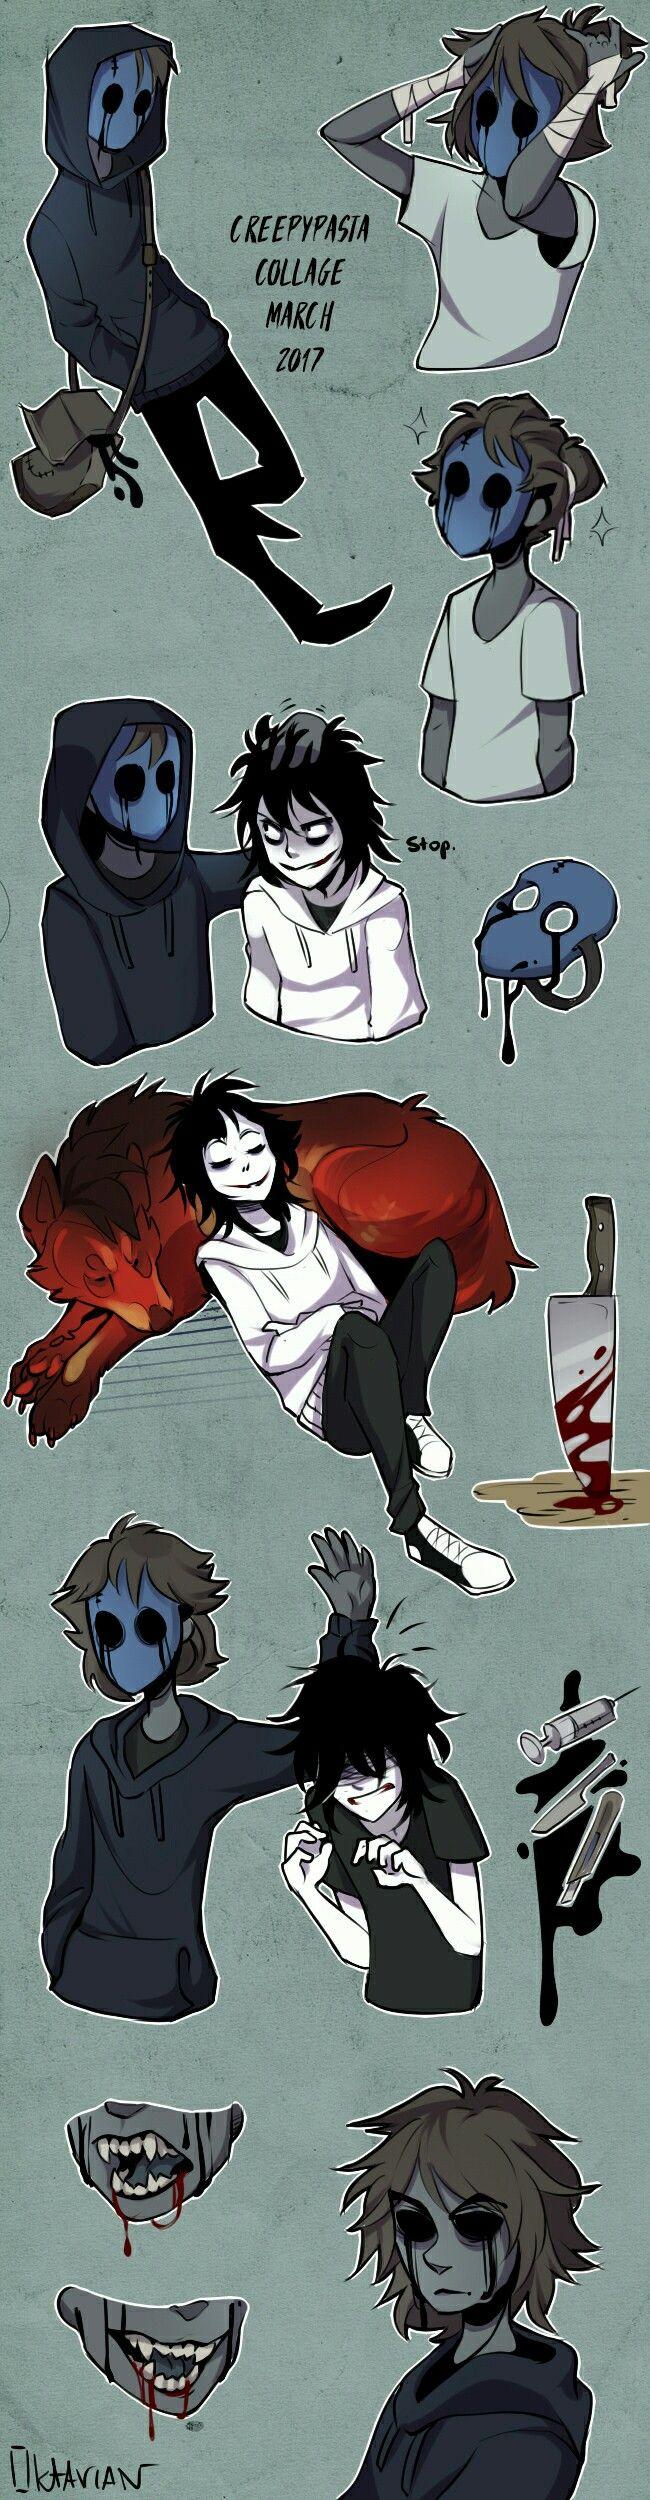 Creepypasta collage March '17 by Oktavian on DeviantArt